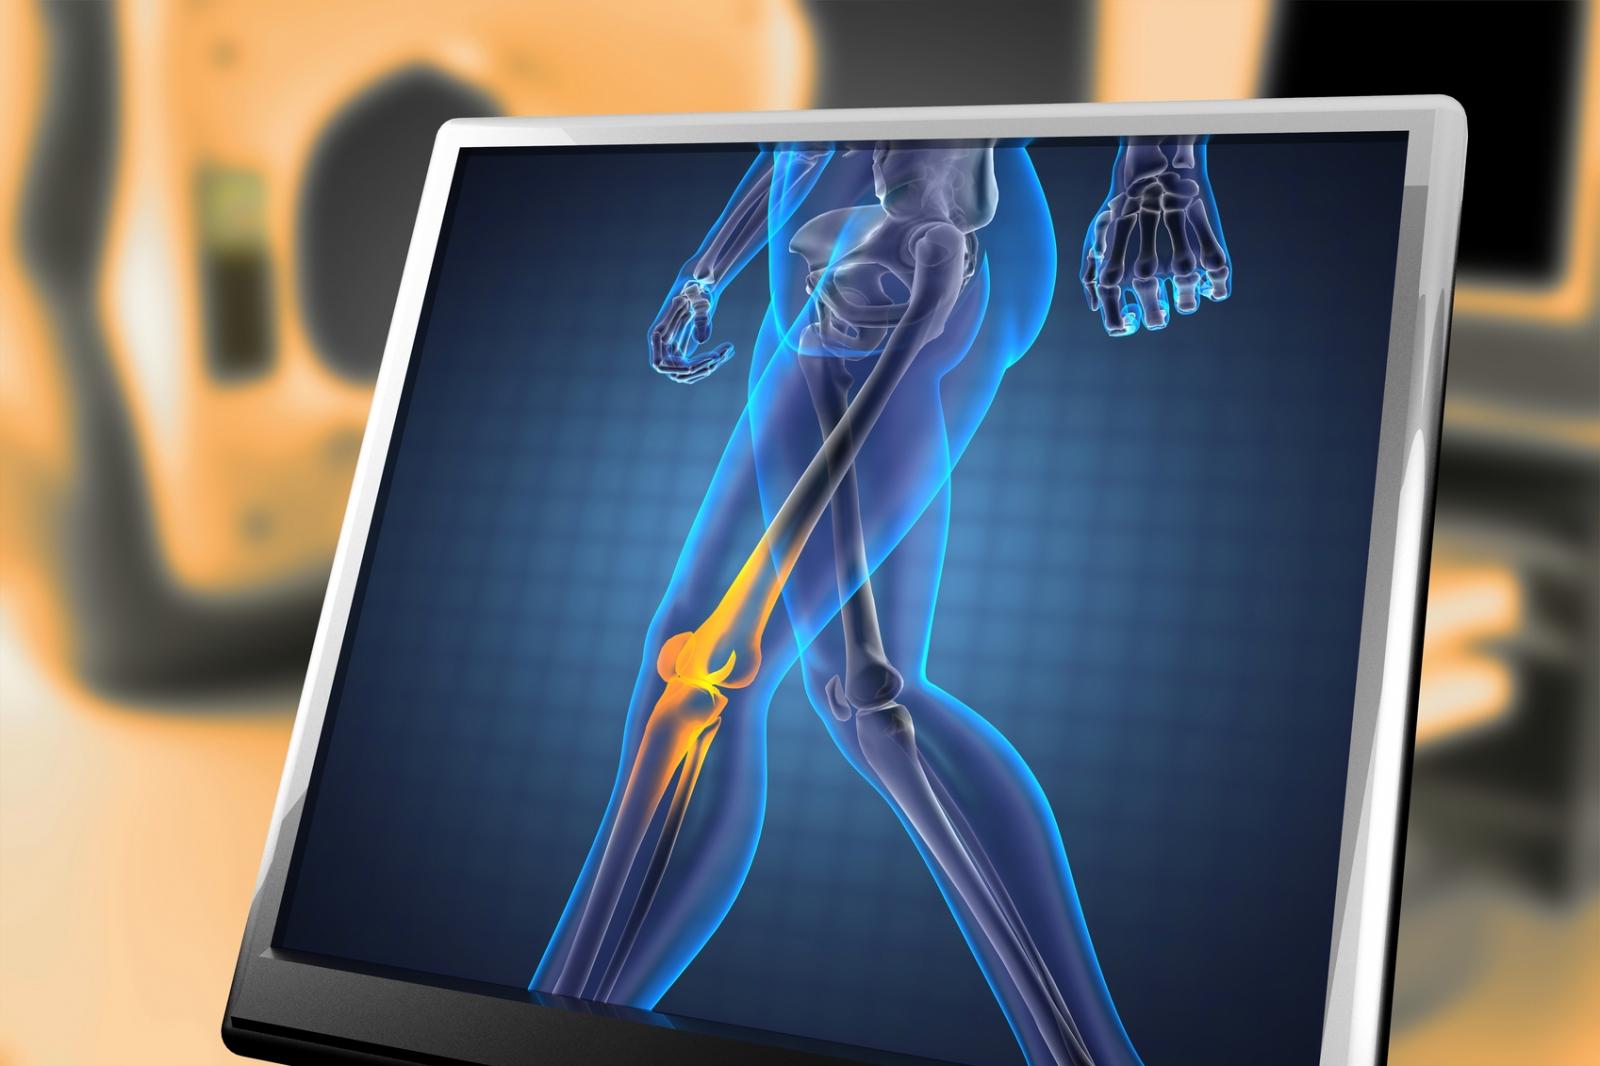 Scan of leg bones in the body